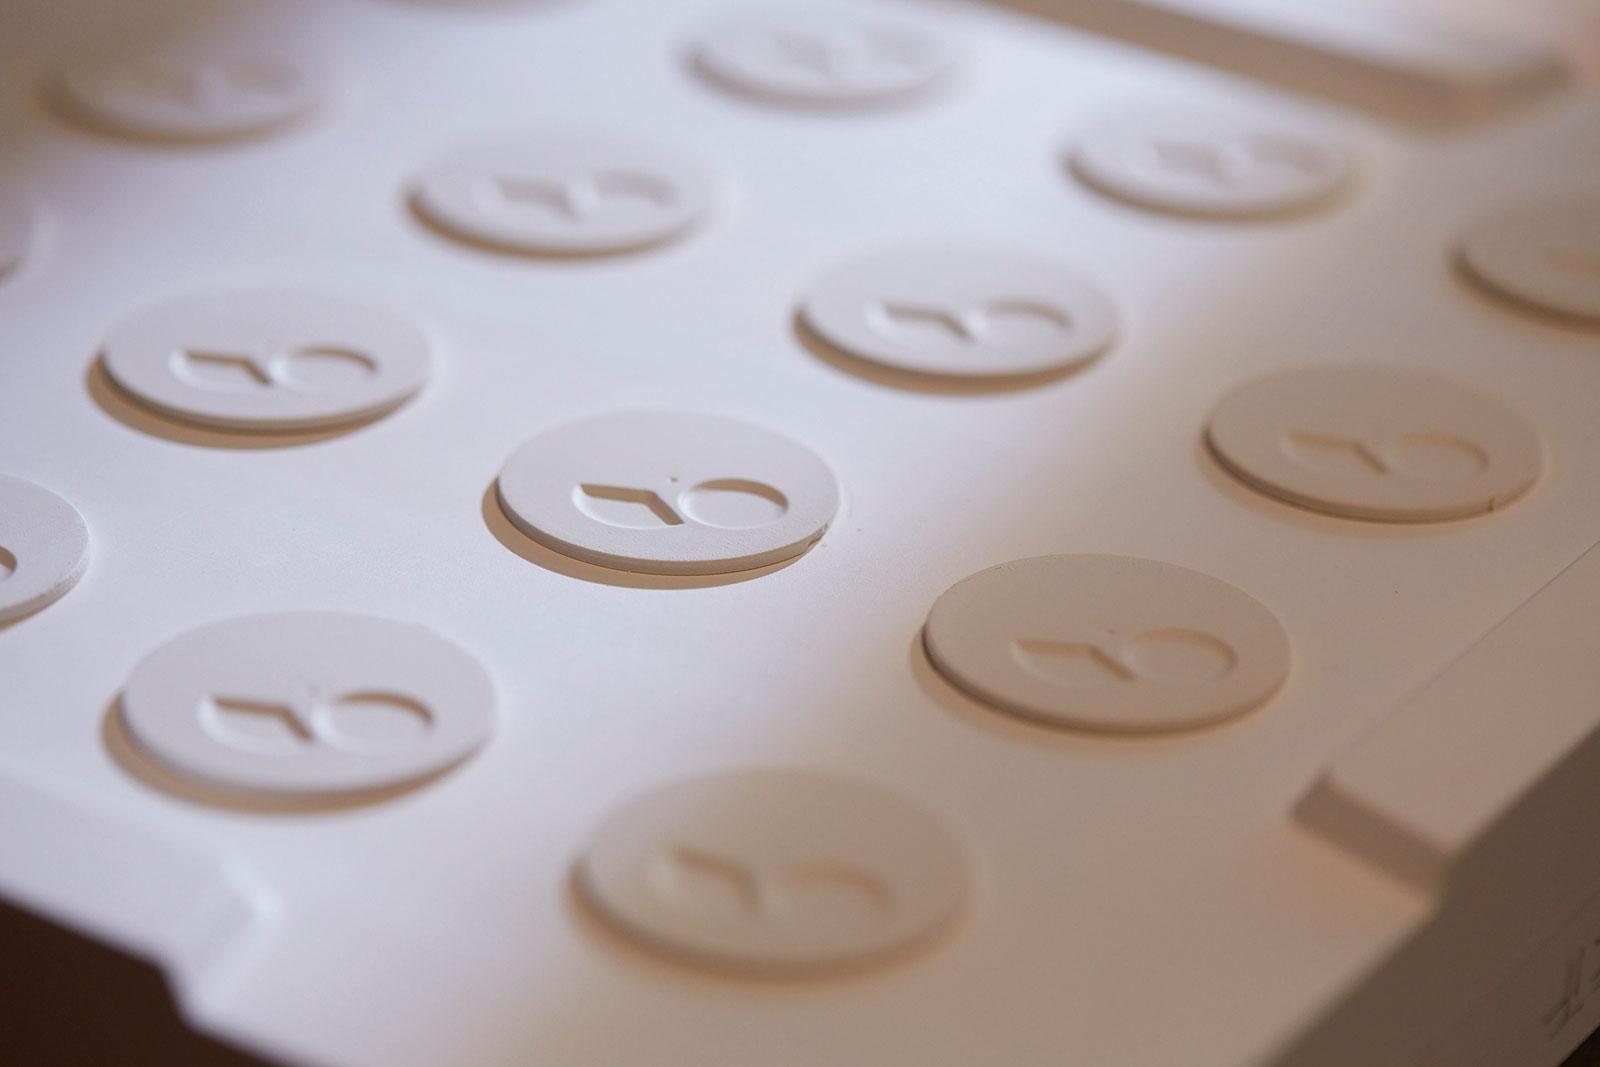 Seiko arita porcelain dial